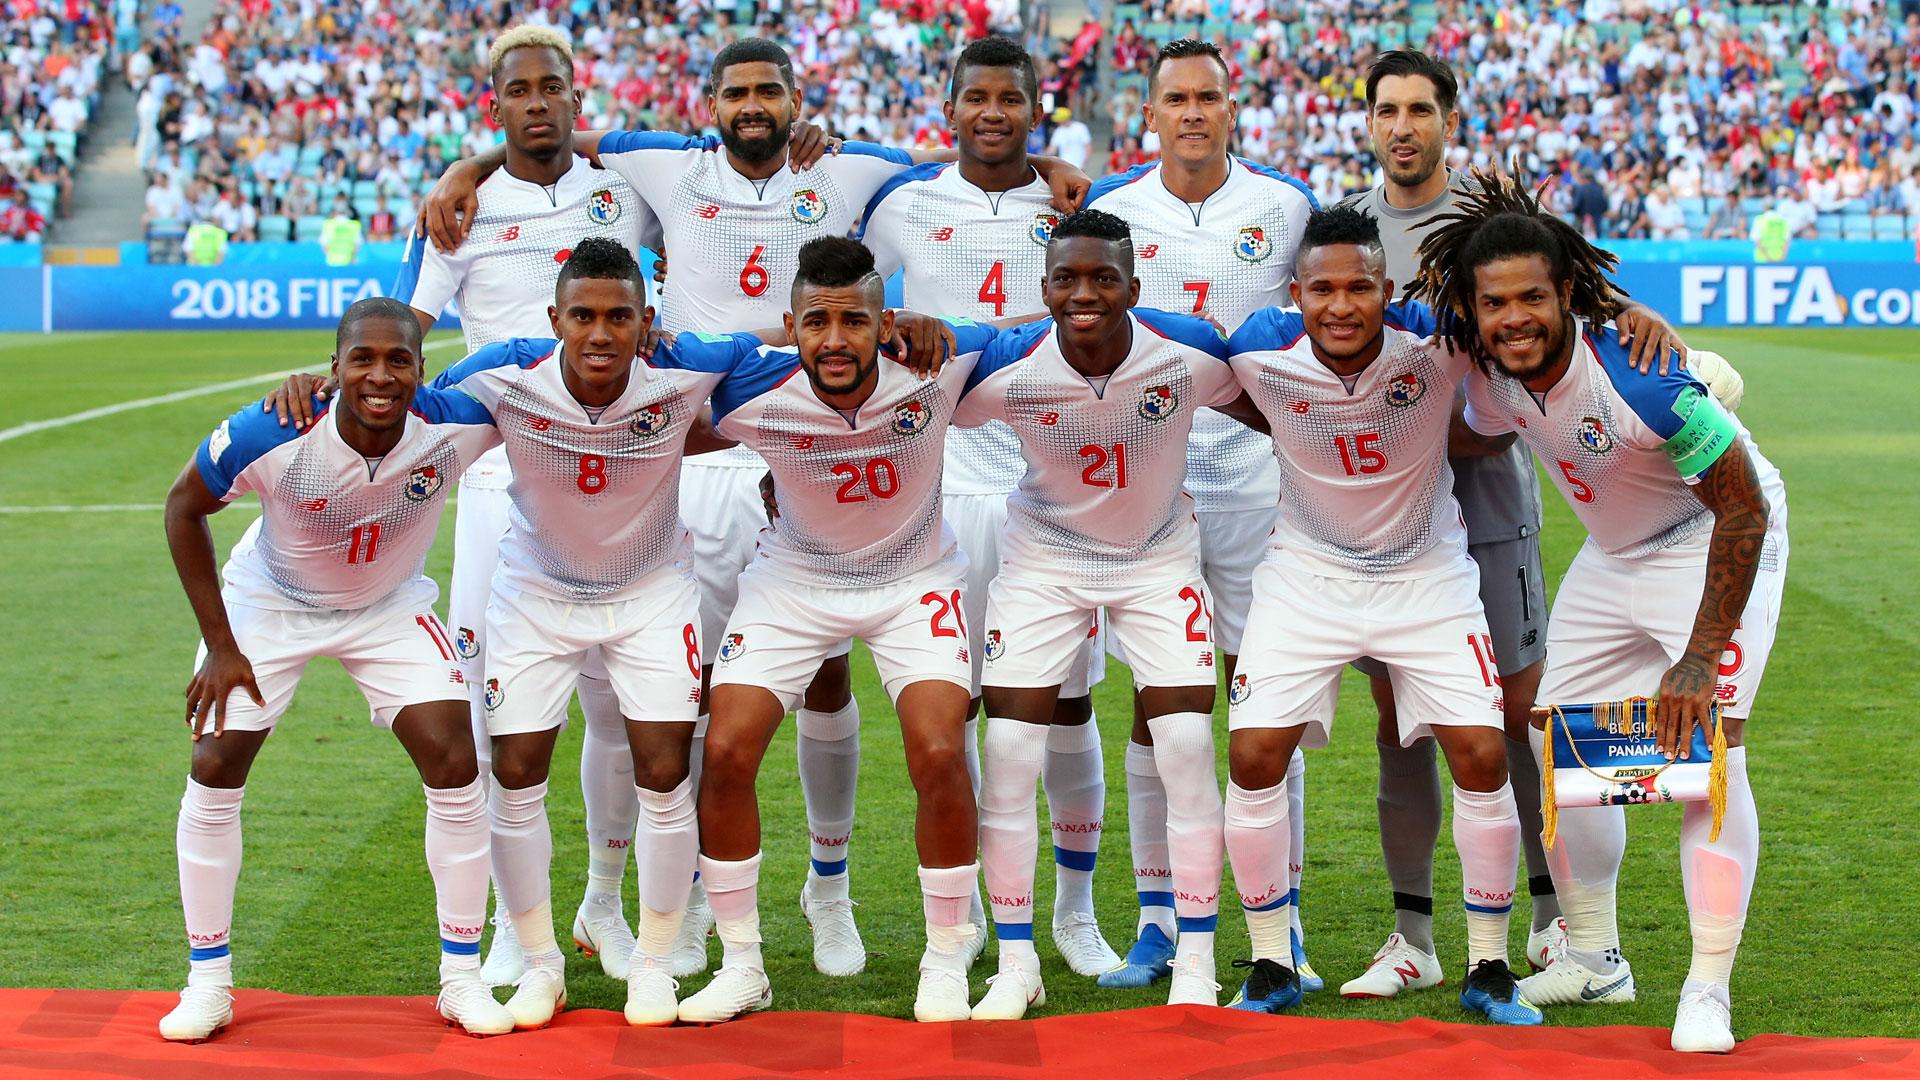 Panama 2018 Ergebnisse WM Kader